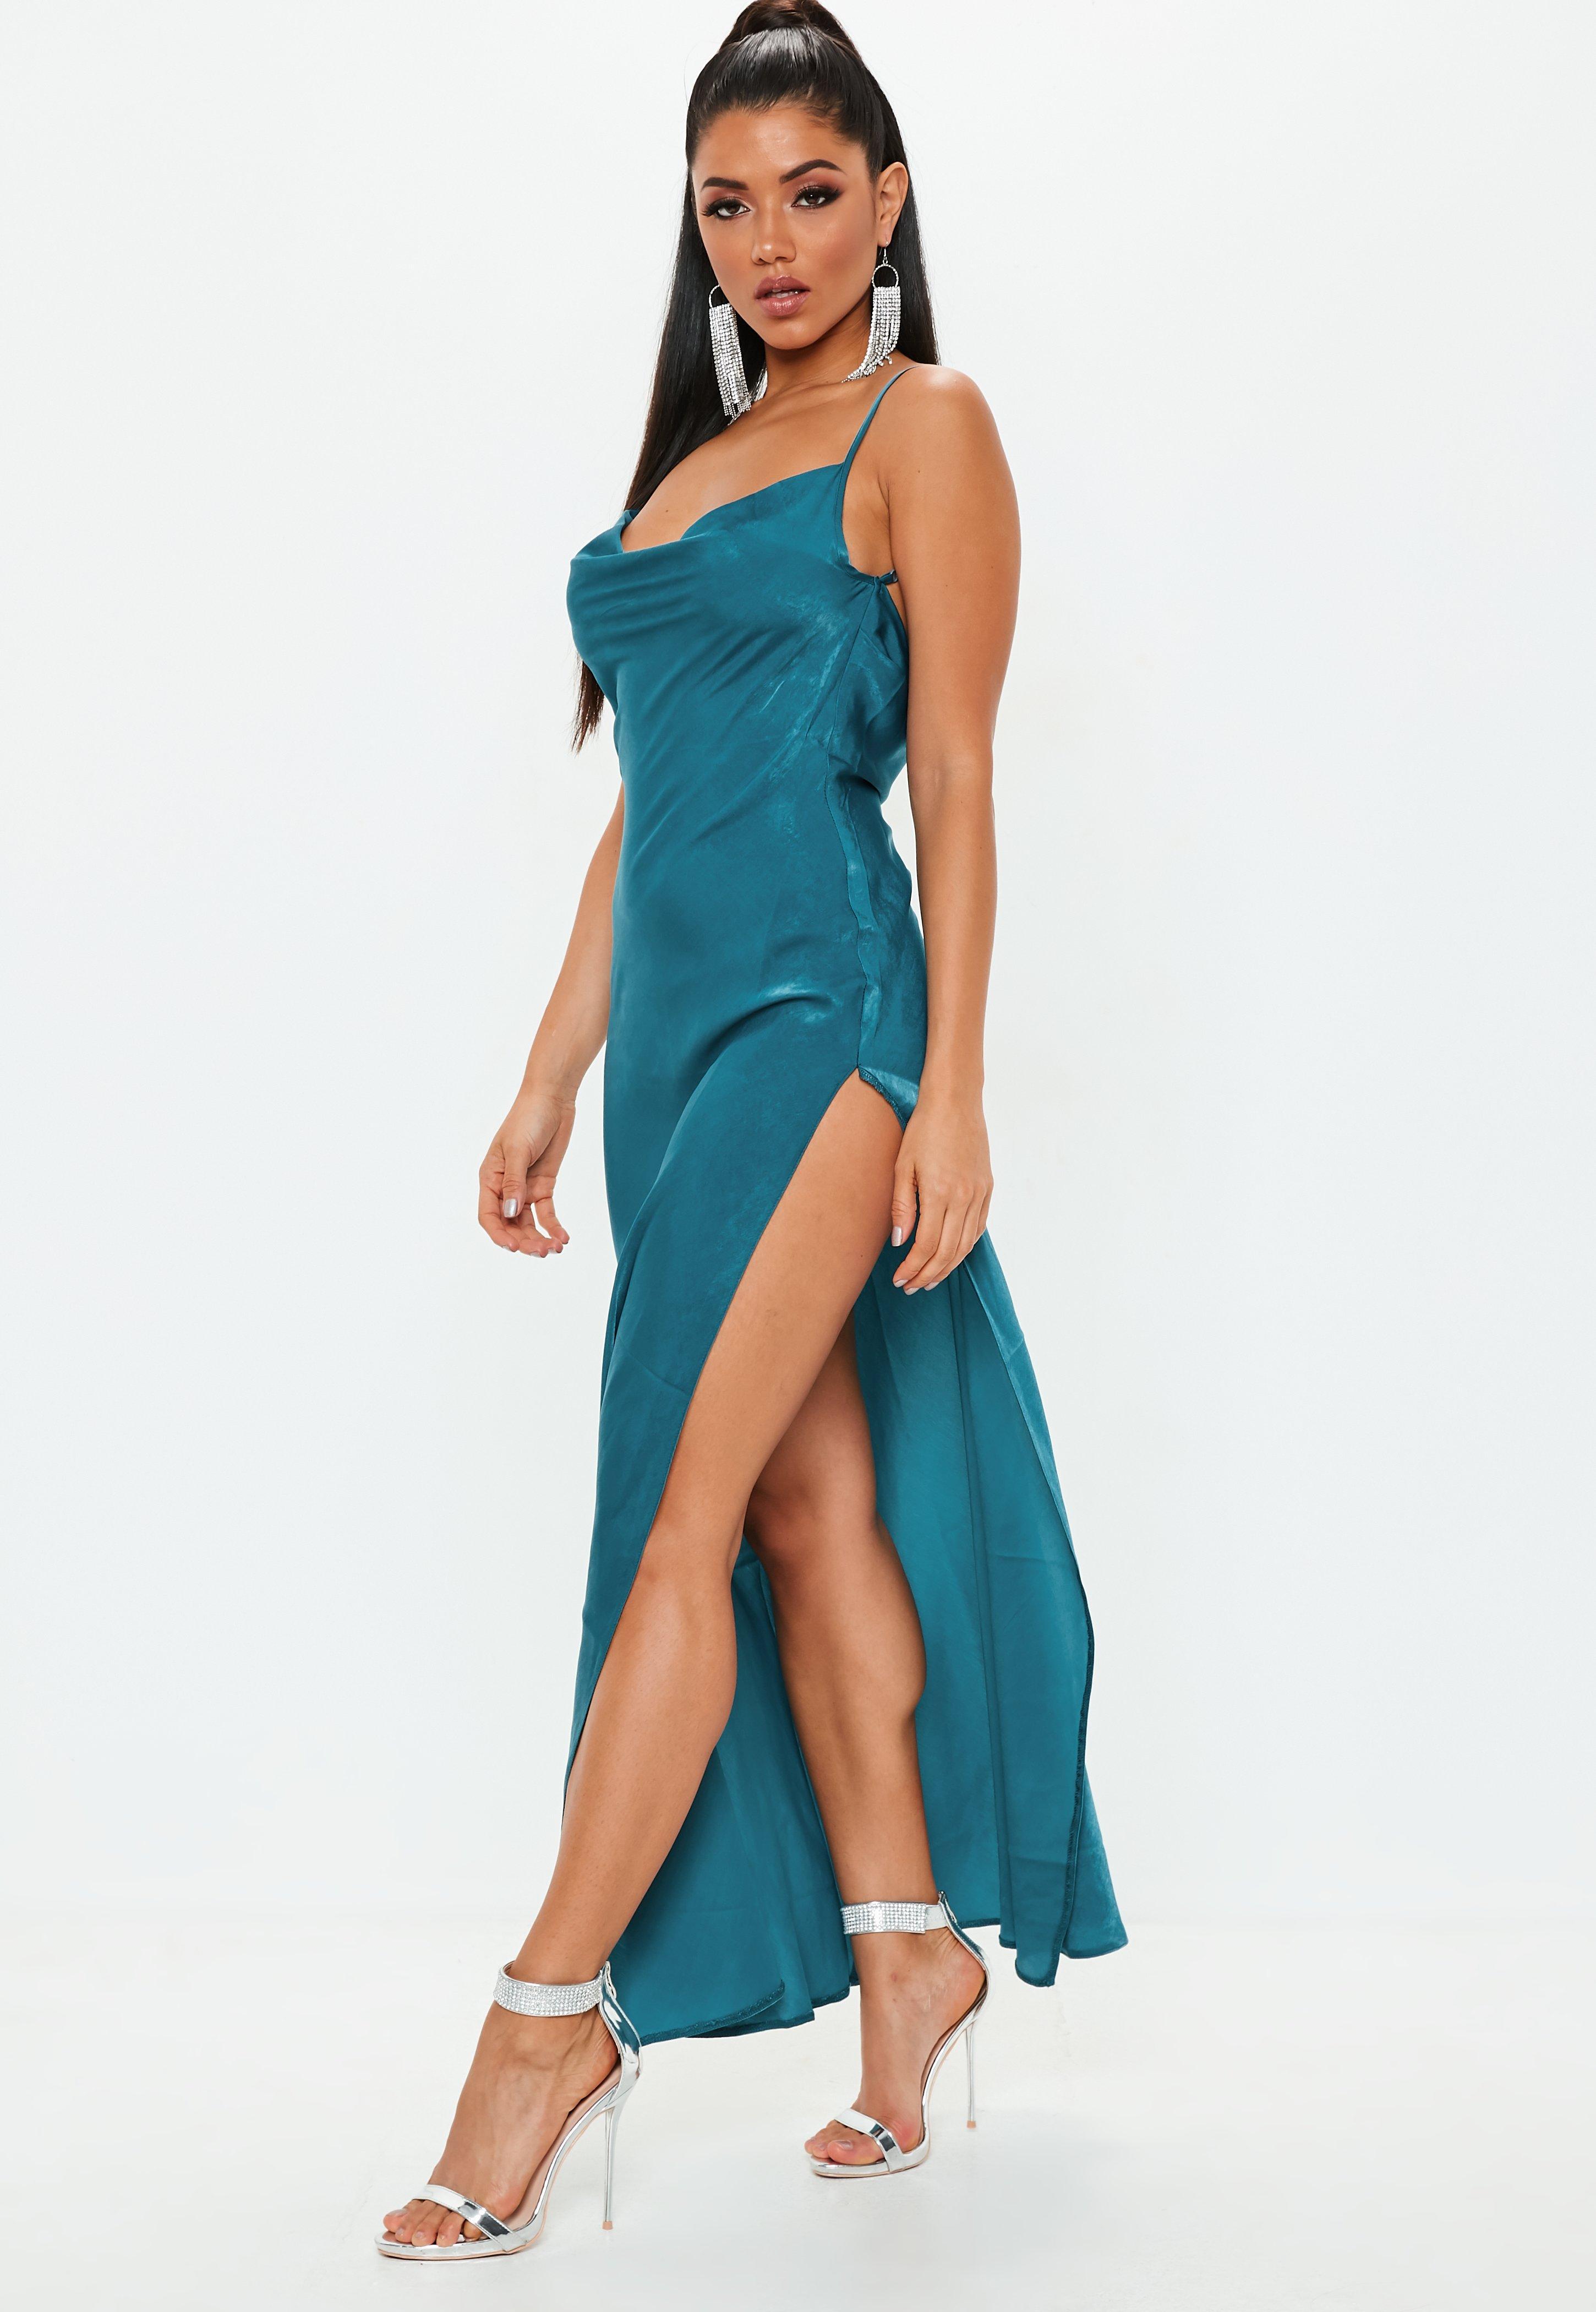 537139223e Backless Dresses